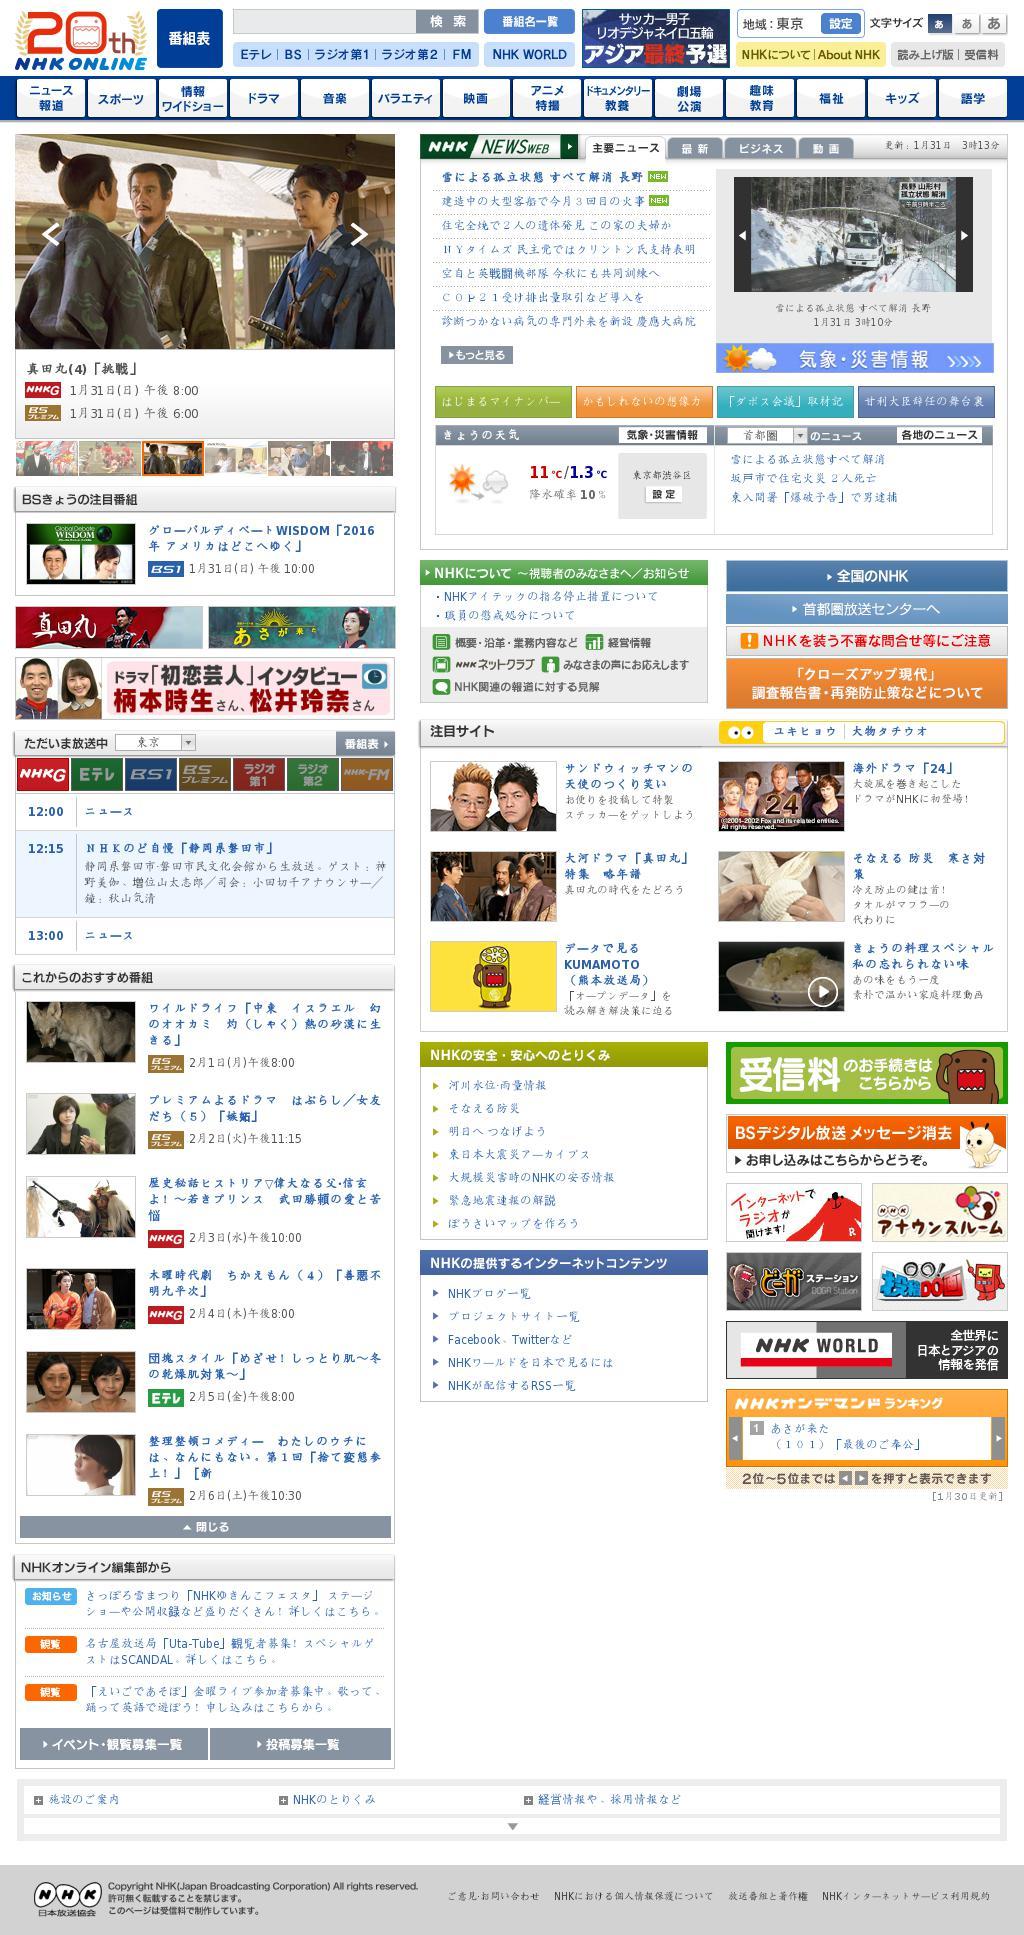 NHK Online at Sunday Jan. 31, 2016, 3:19 a.m. UTC